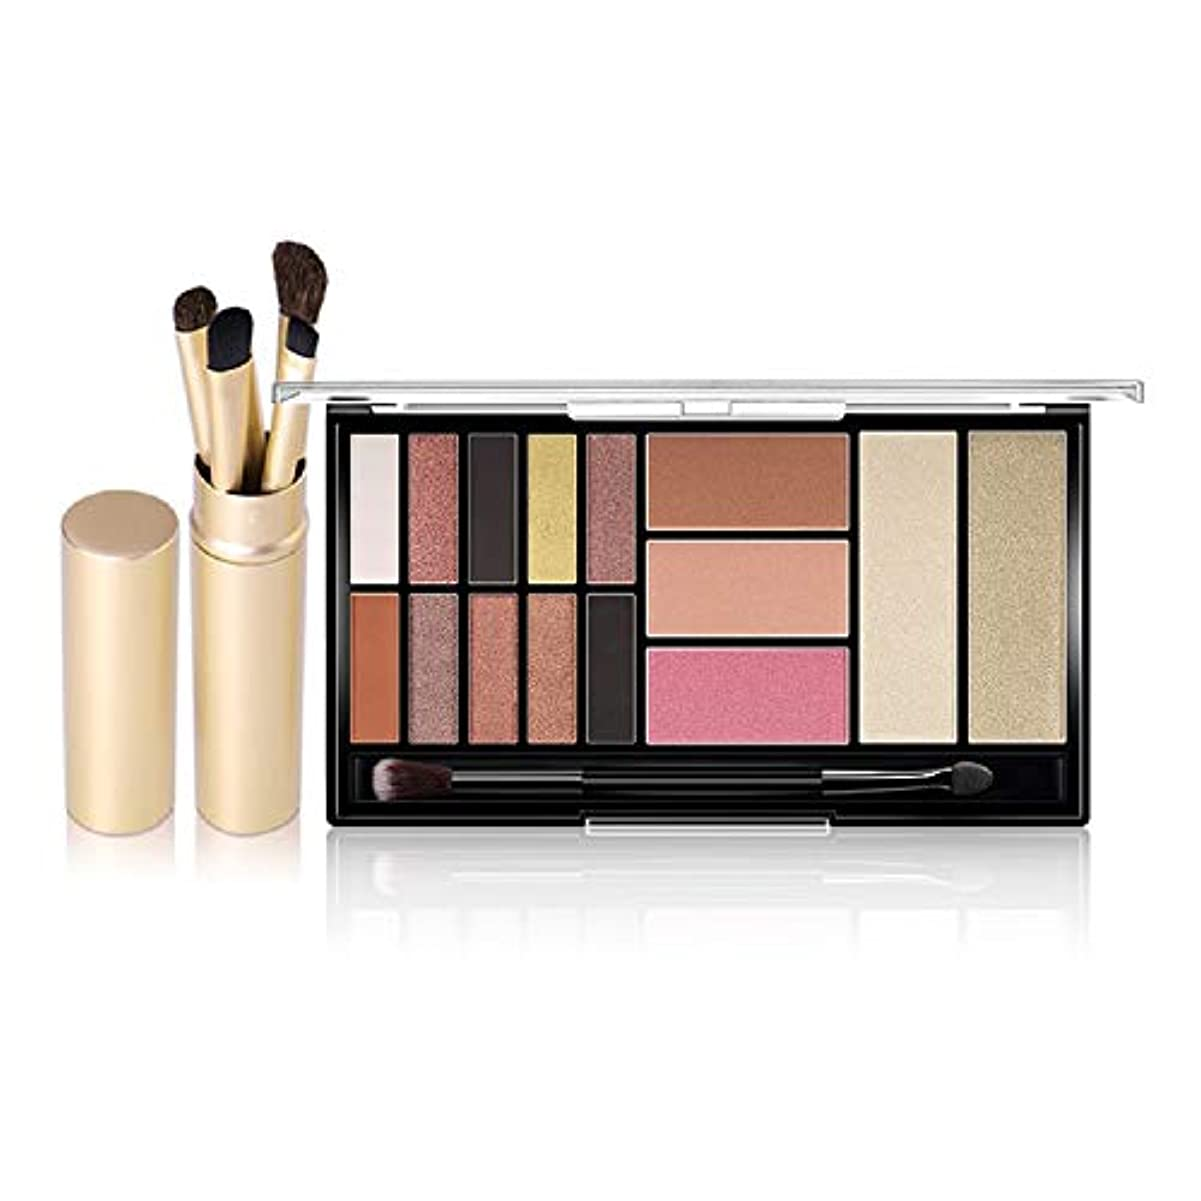 New Arrival Palette Eyeshadow Highlighter Glitter Cheek Blush Contour Matte Smoky Eye Shadow Palette 15 Shades...